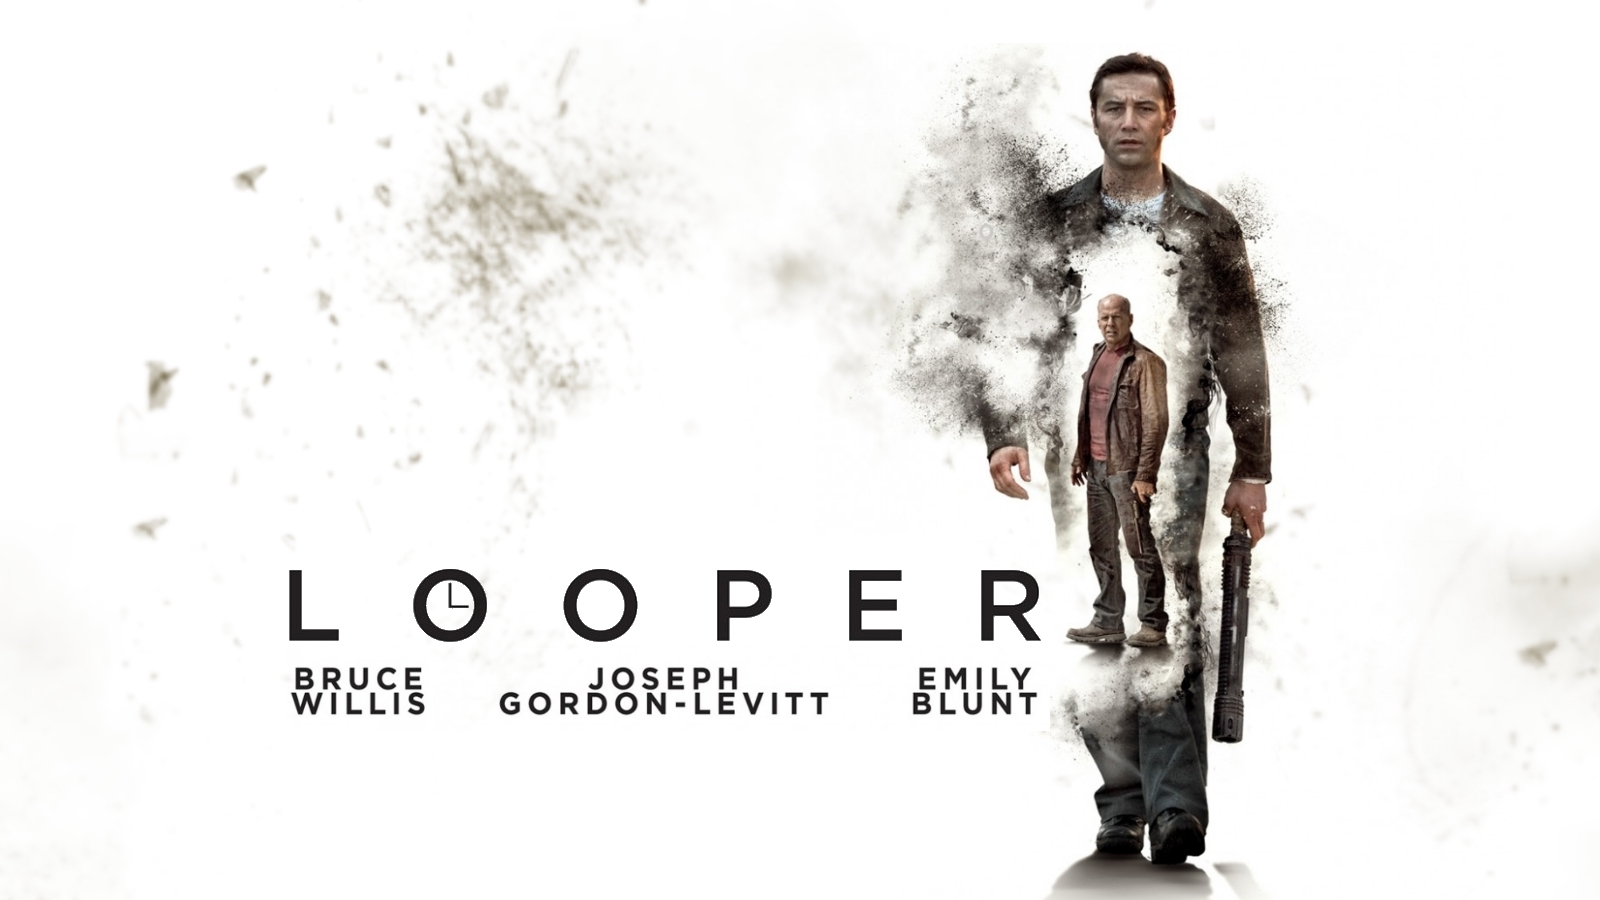 http://2.bp.blogspot.com/-agzYUvhvX4Q/UF3kFTFNvRI/AAAAAAAAQlo/0iXmAkhSVYY/s1600/Looper_Movie_Wallpaper_1600x900.jpg